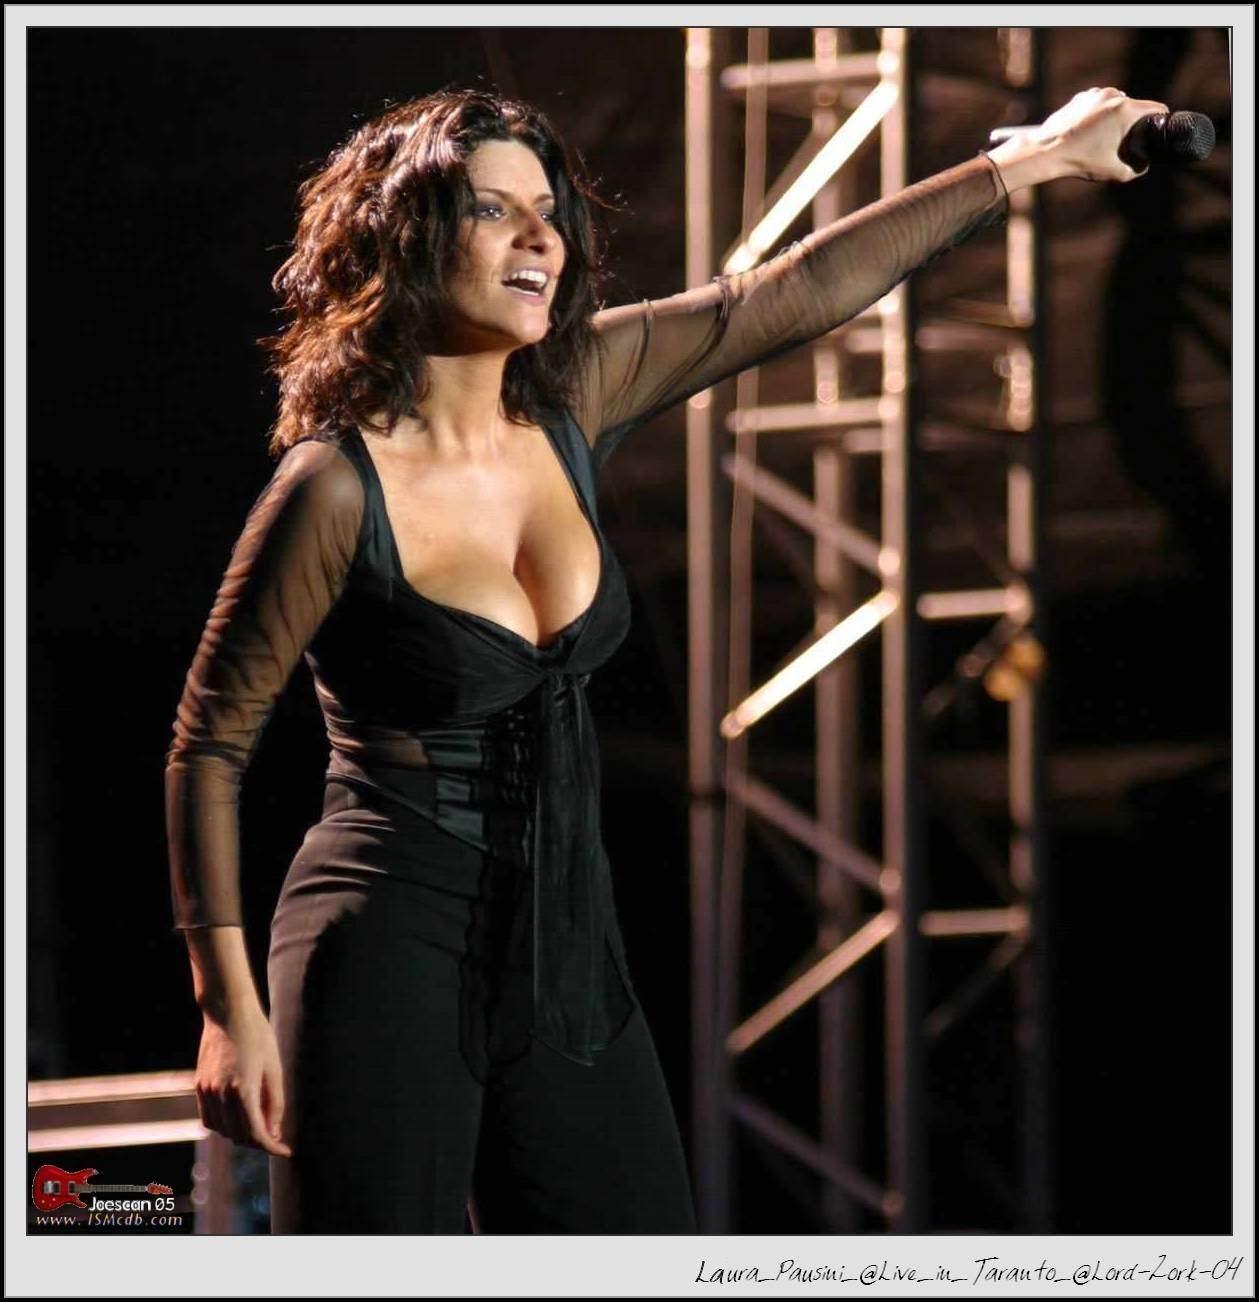 HVAC reccomend Laura pausini nake